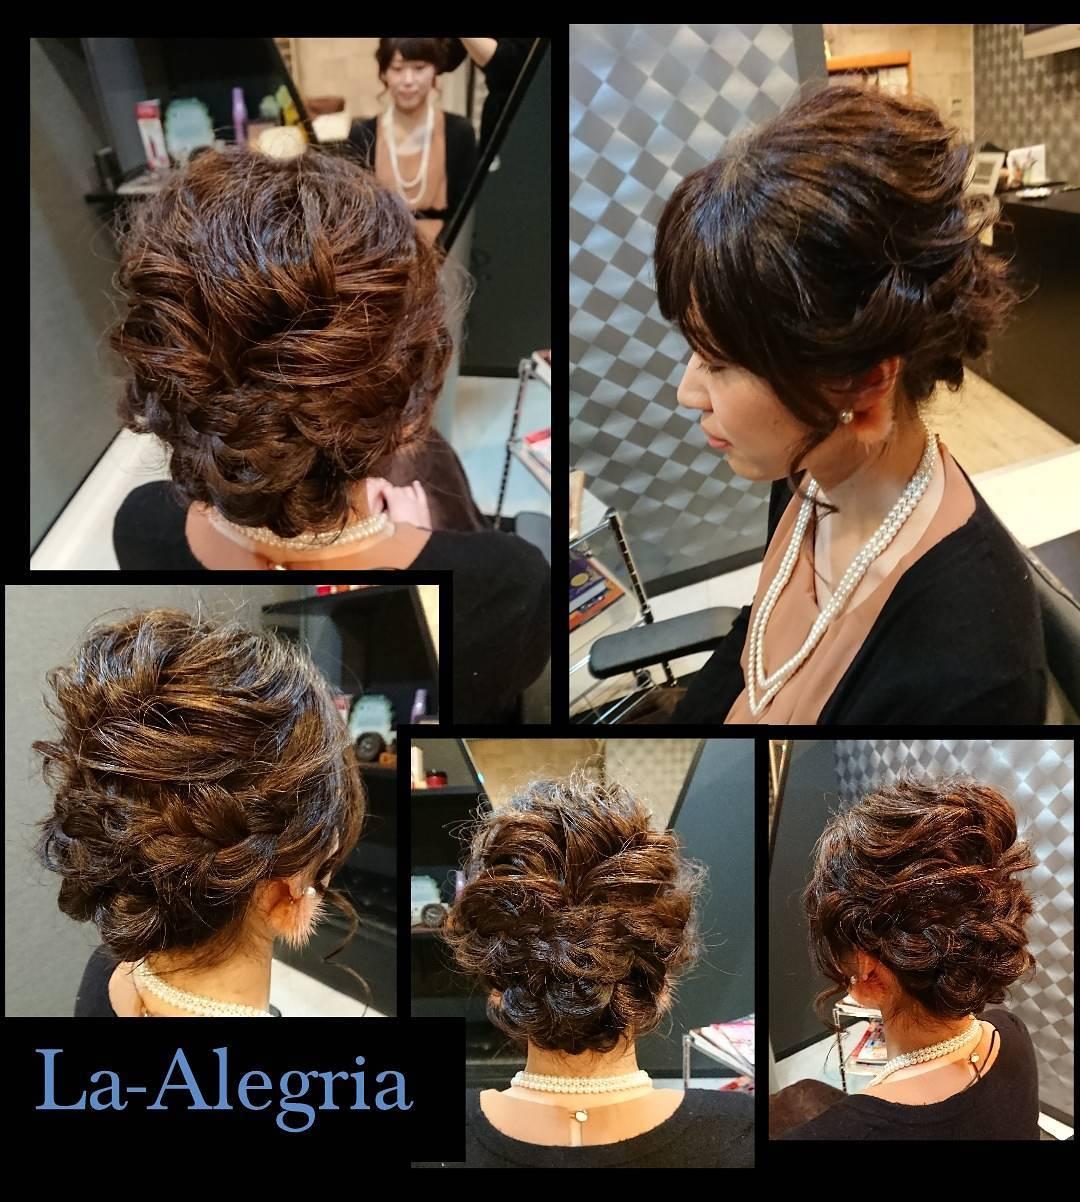 http://beauty-salon-la-alegria-ubecity.com/news/322.jpg